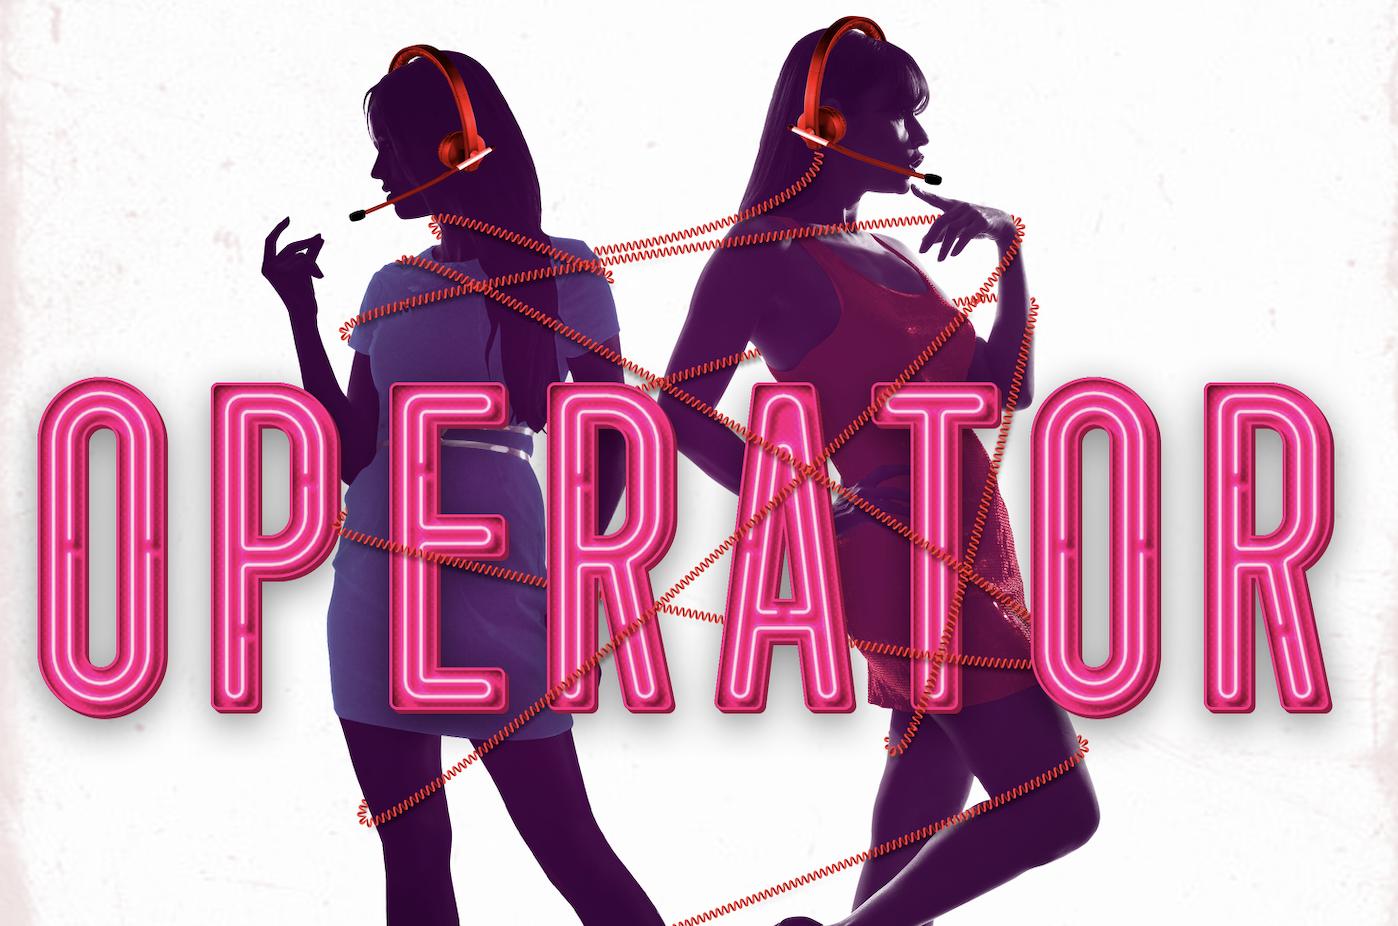 Telephone Sex Podcast Series 'Operator' Set At Wondery